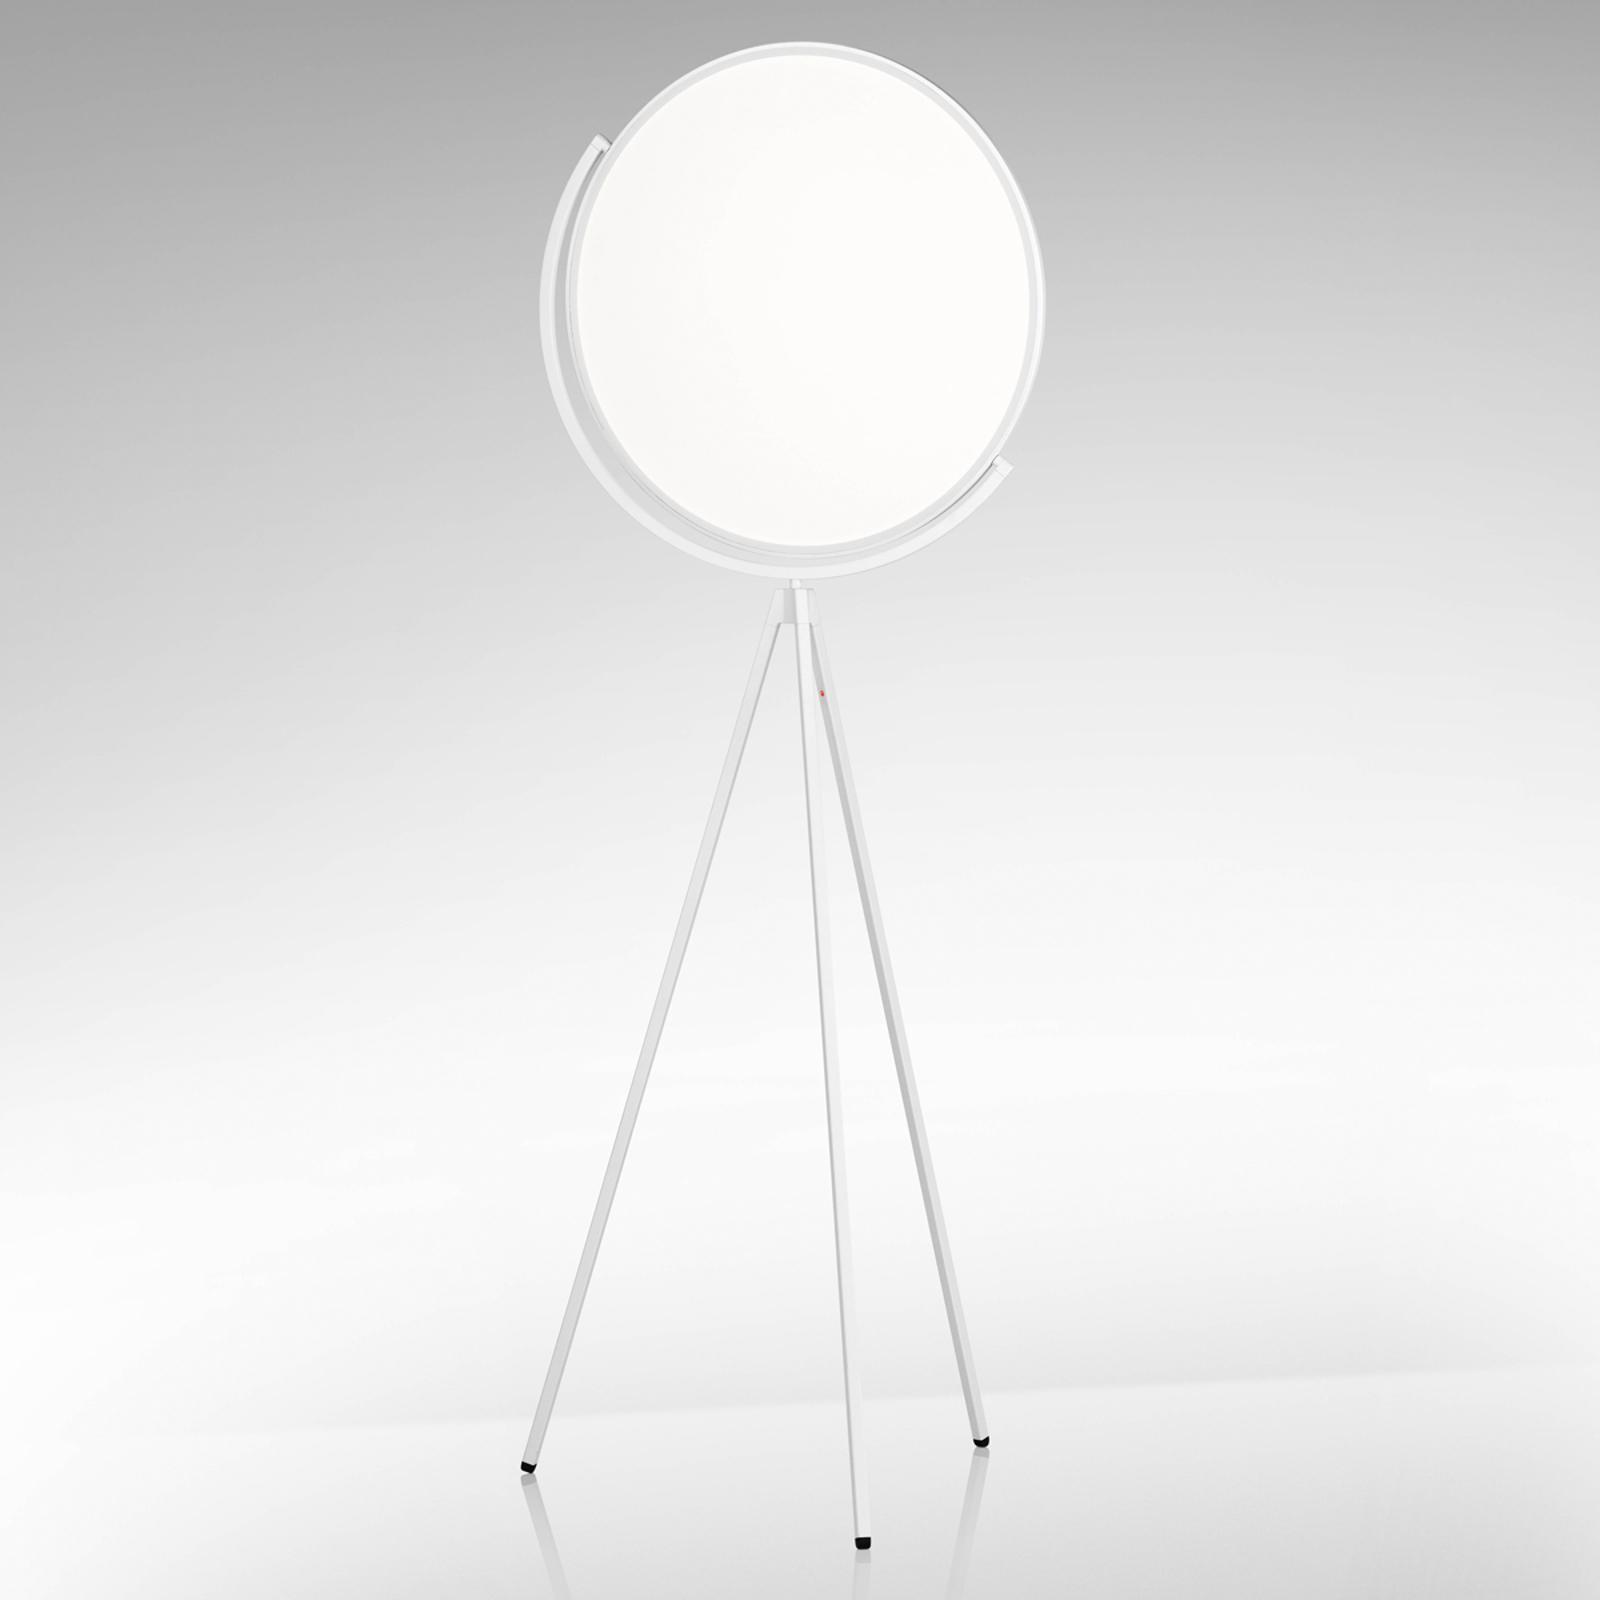 Witte designvloerlamp Superloon met LED